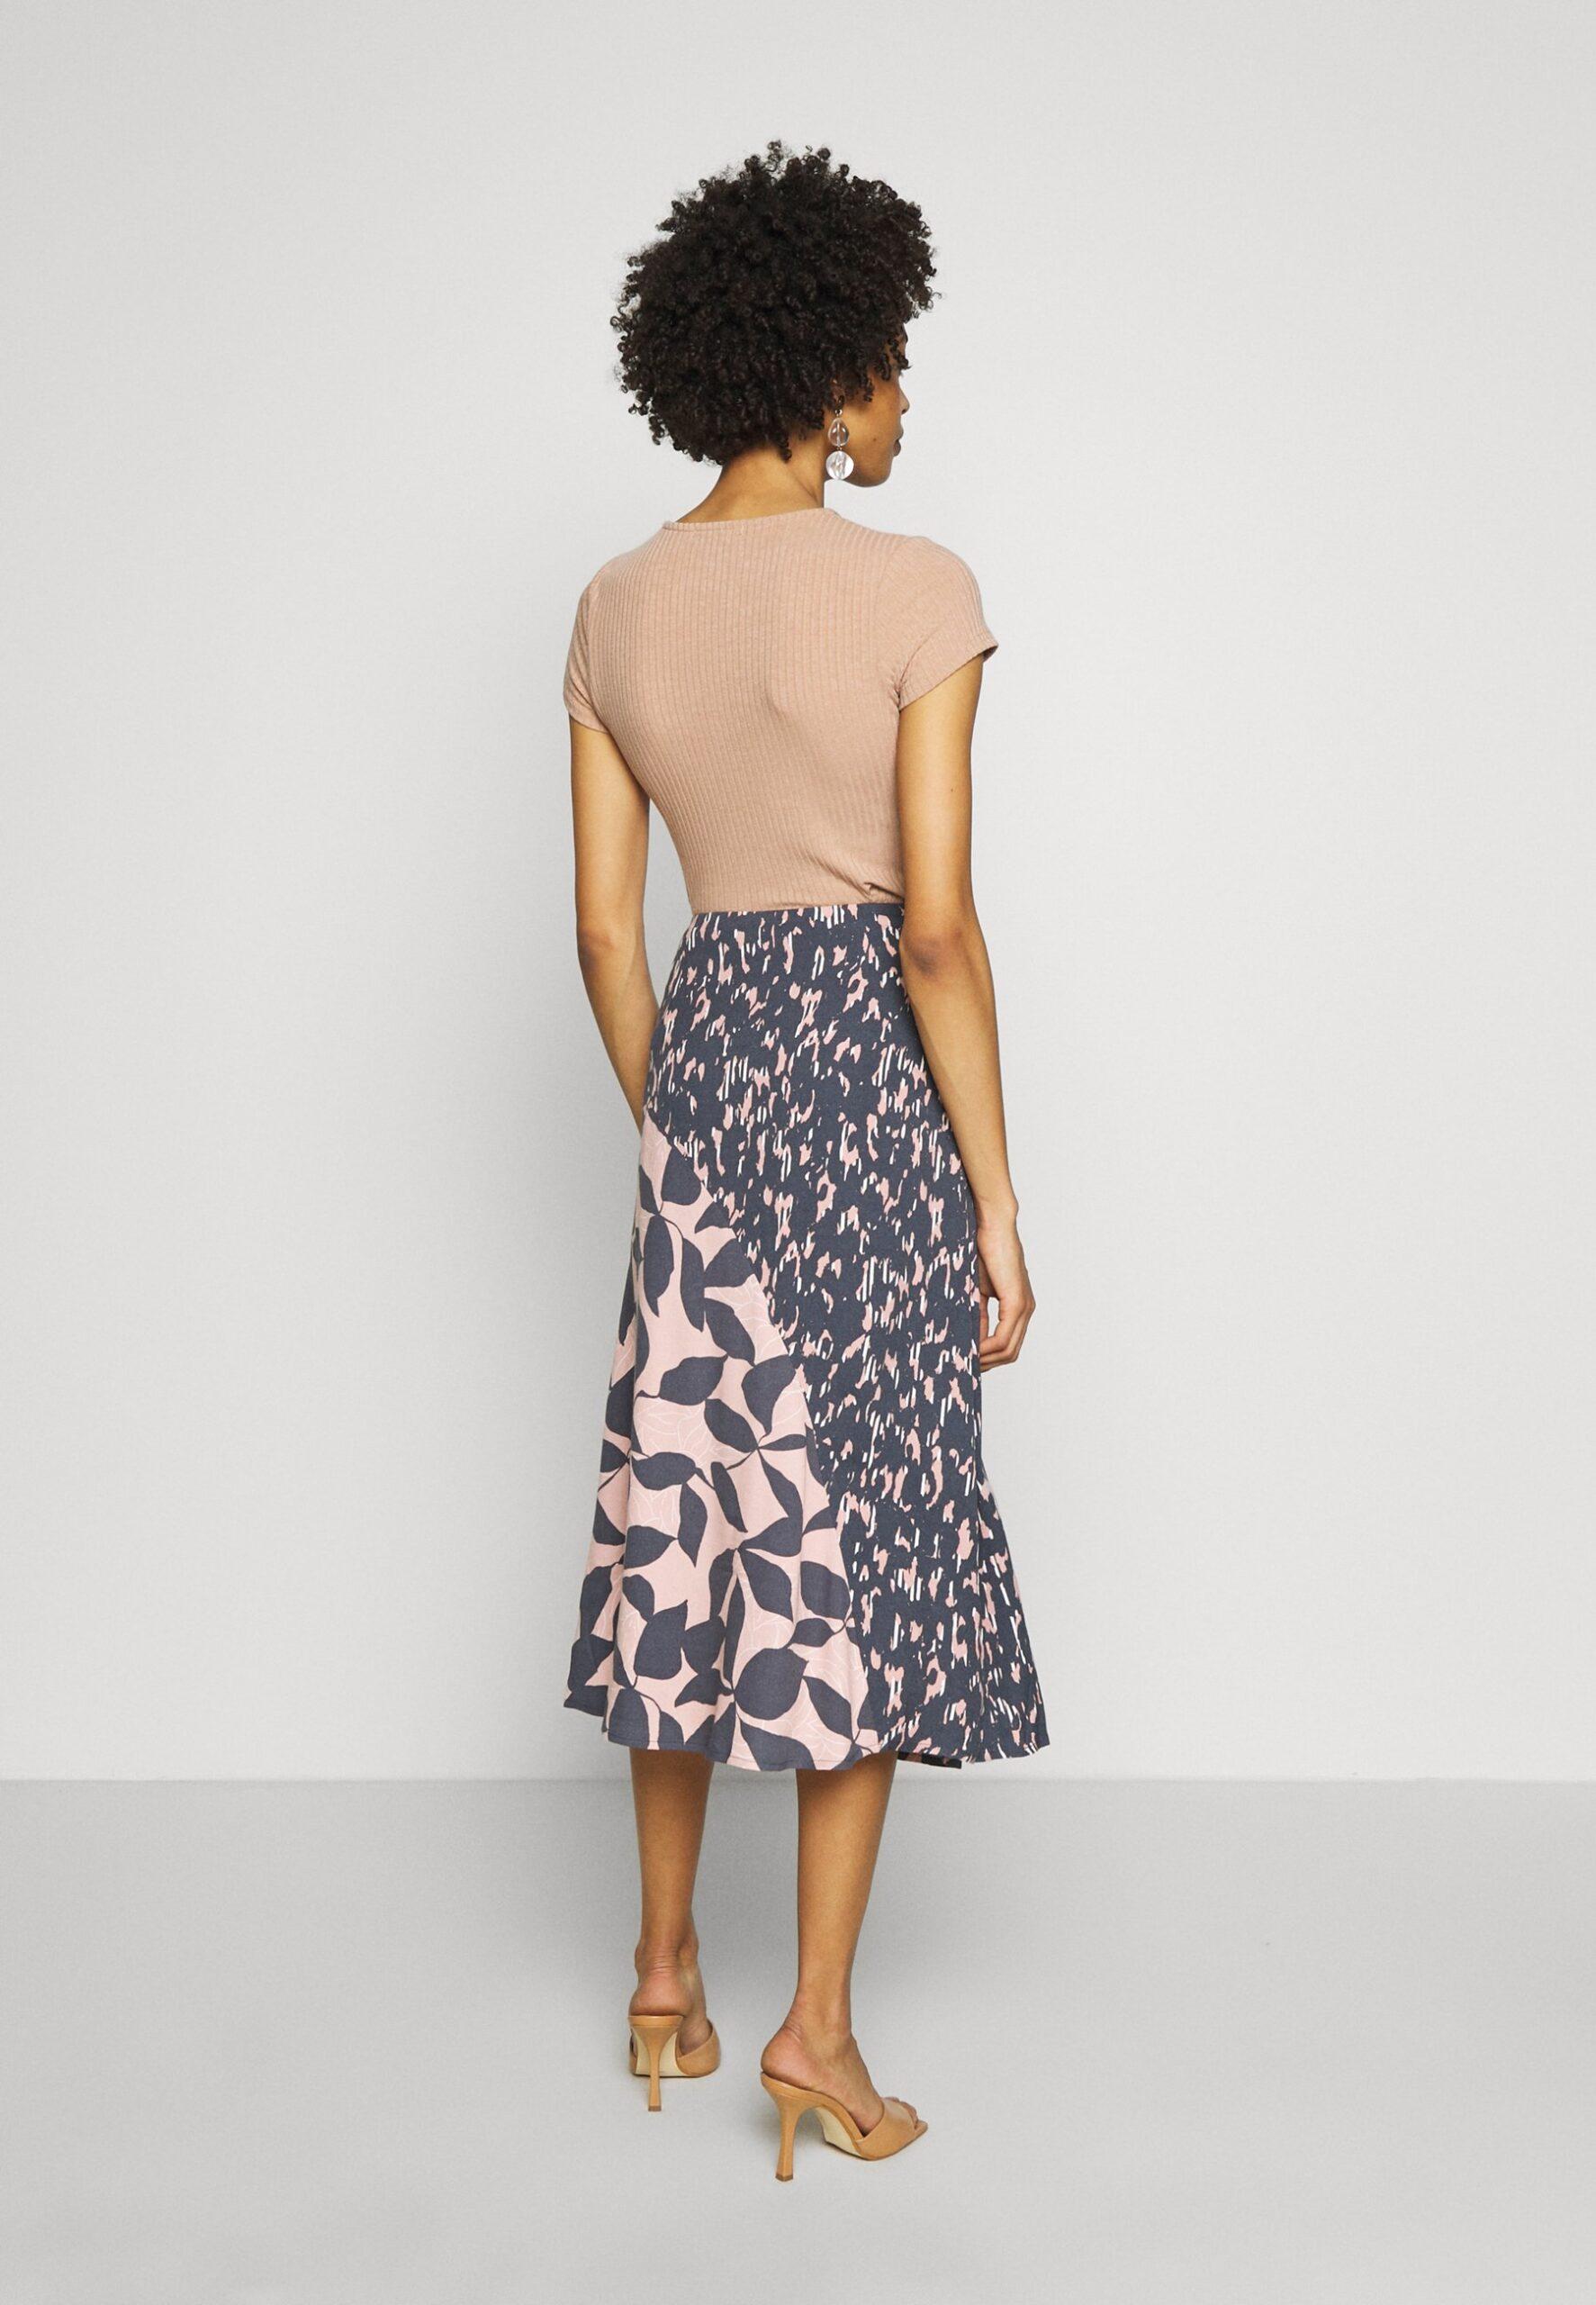 White Stuff | Hidden Tiger Skirt - Grey & Pink